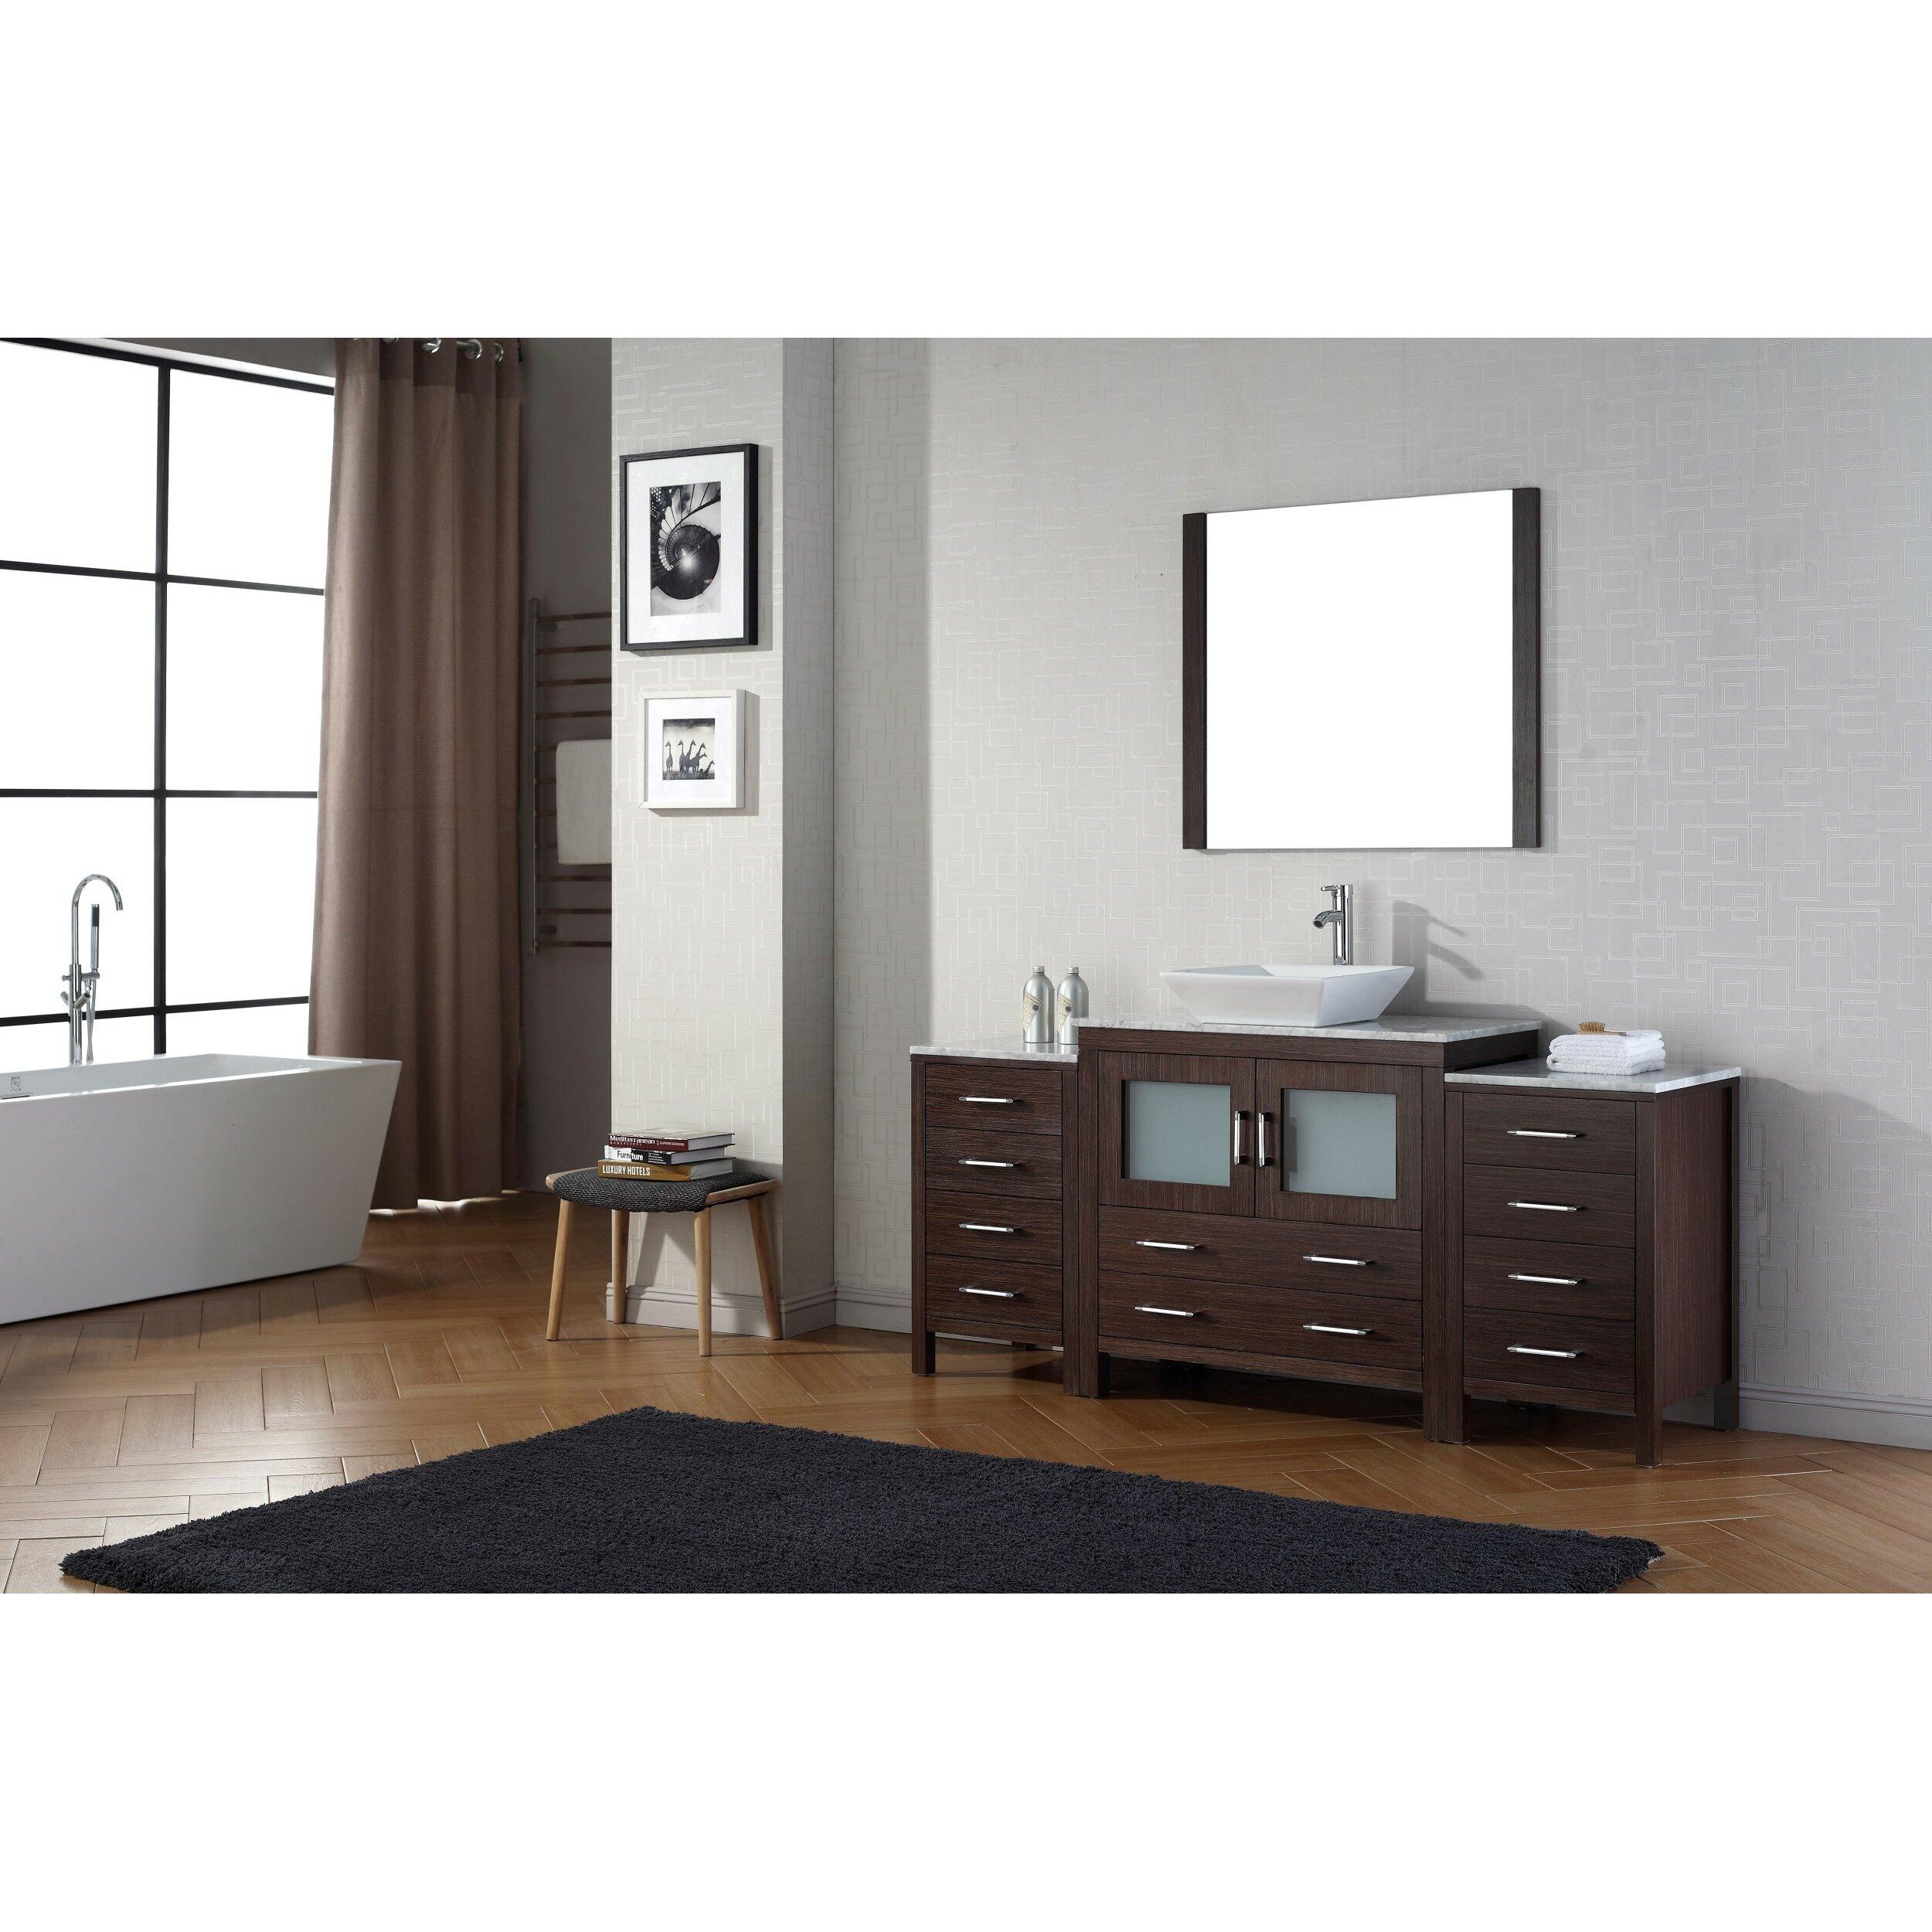 "Virtu Dior 66"" Single Bathroom Vanity Set with Mirror"